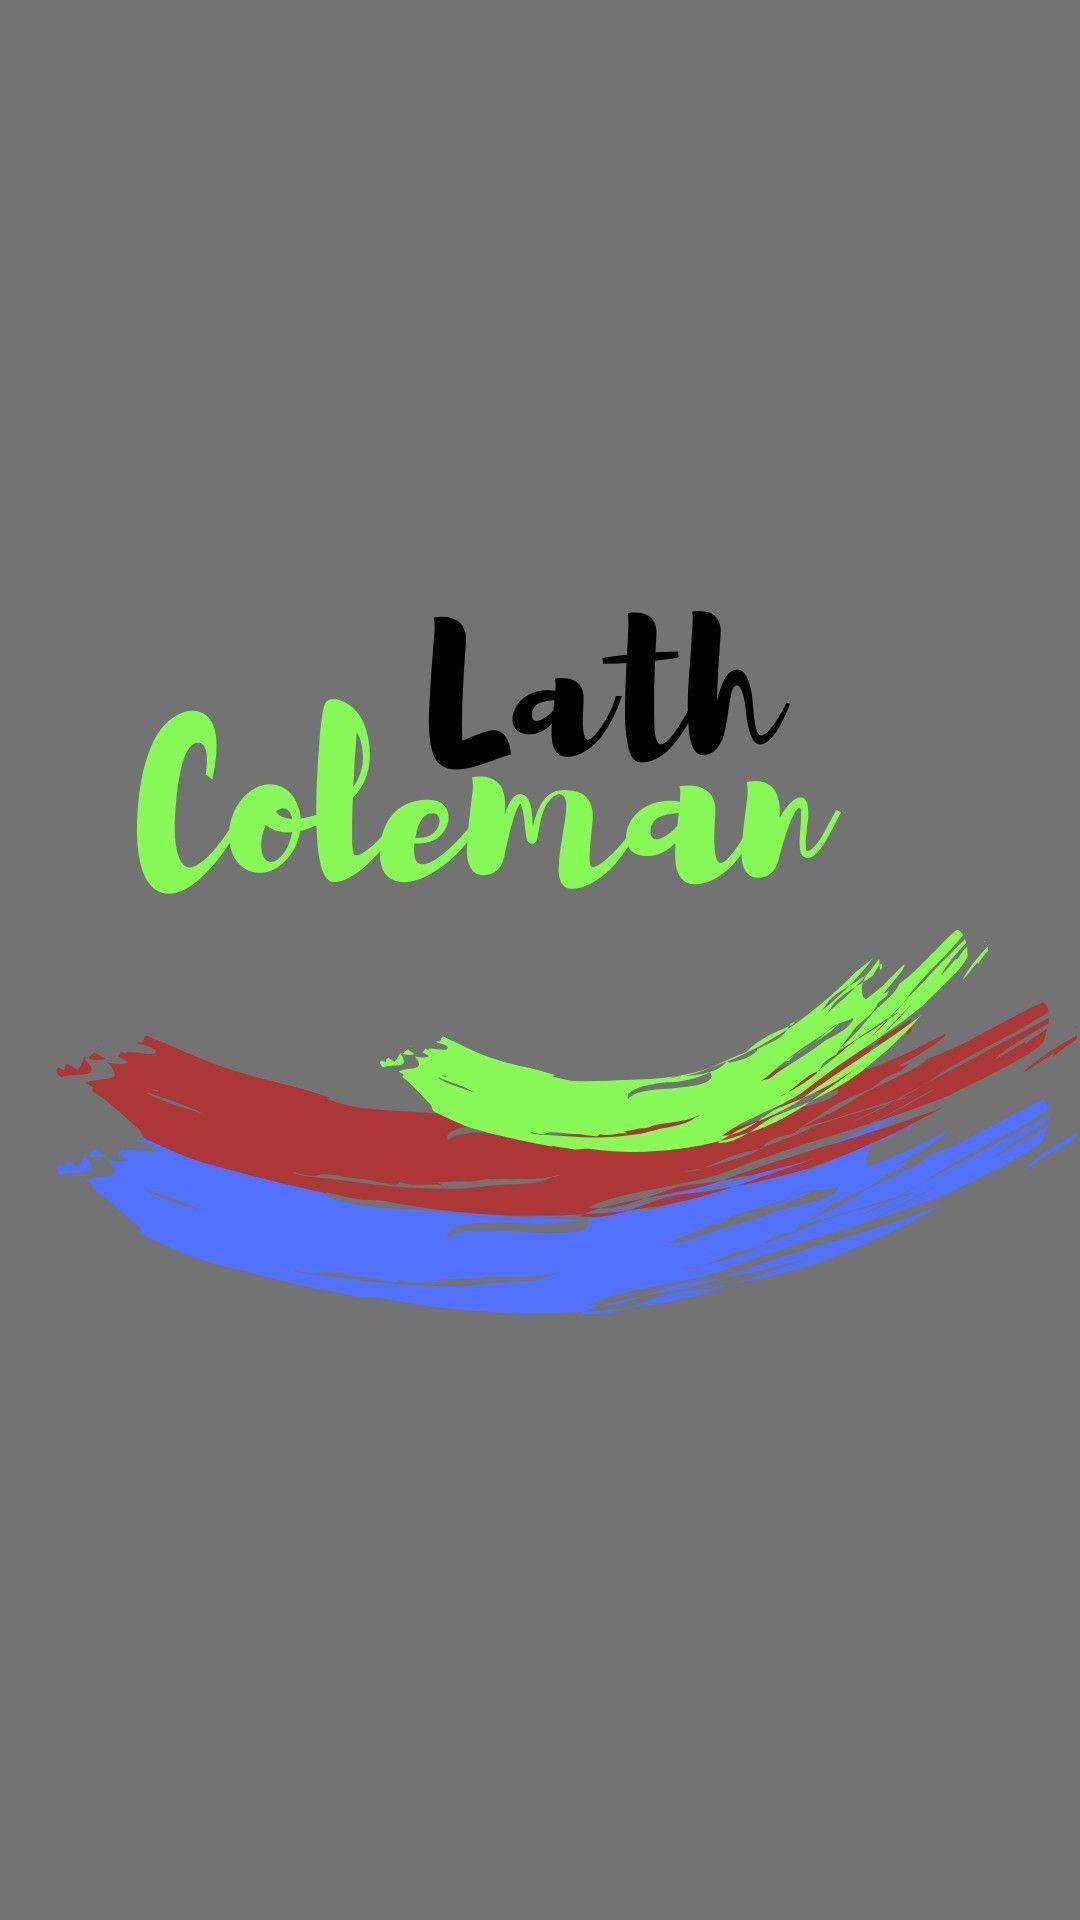 Lath Coleman (Possessive Series) 💚 Cecelib | Wattpad